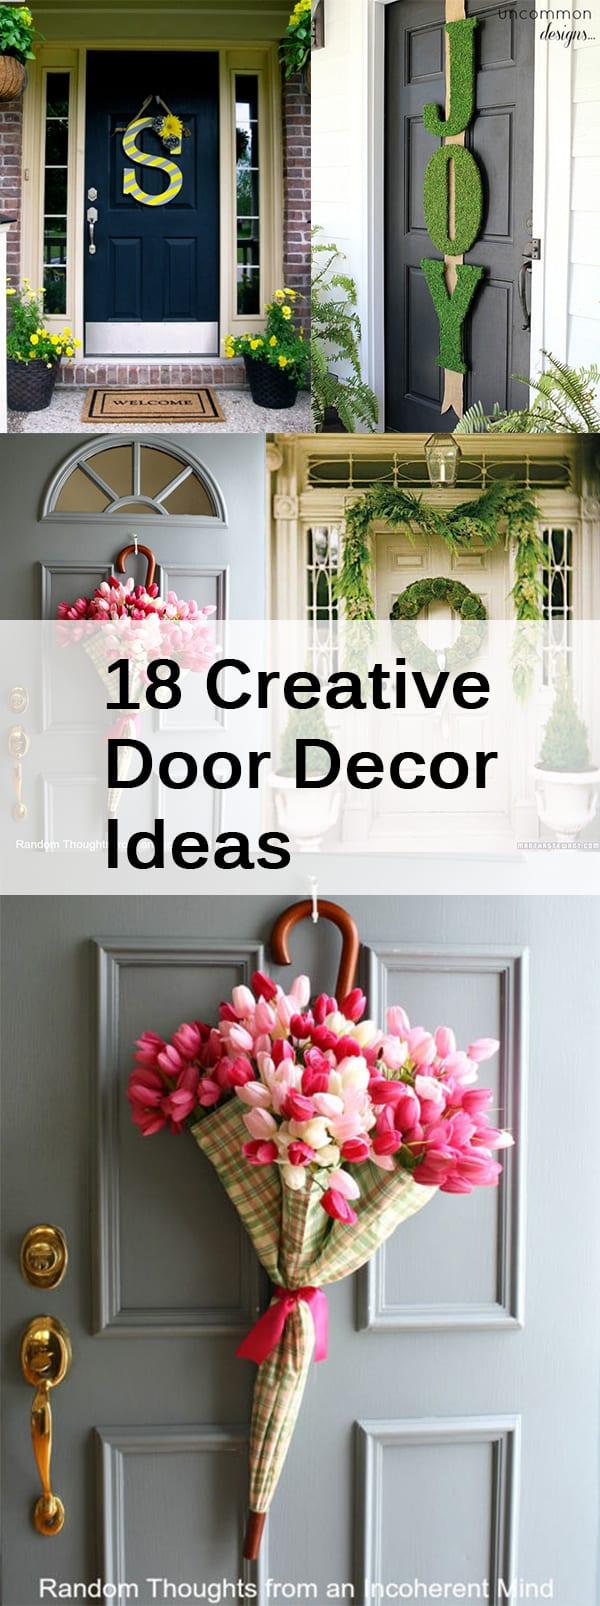 Creative door decor, porch decor, DIY home decor, popular pin, DIY porch decor, holiday porch decor, DIY wreaths, easy curb appeal projects. .